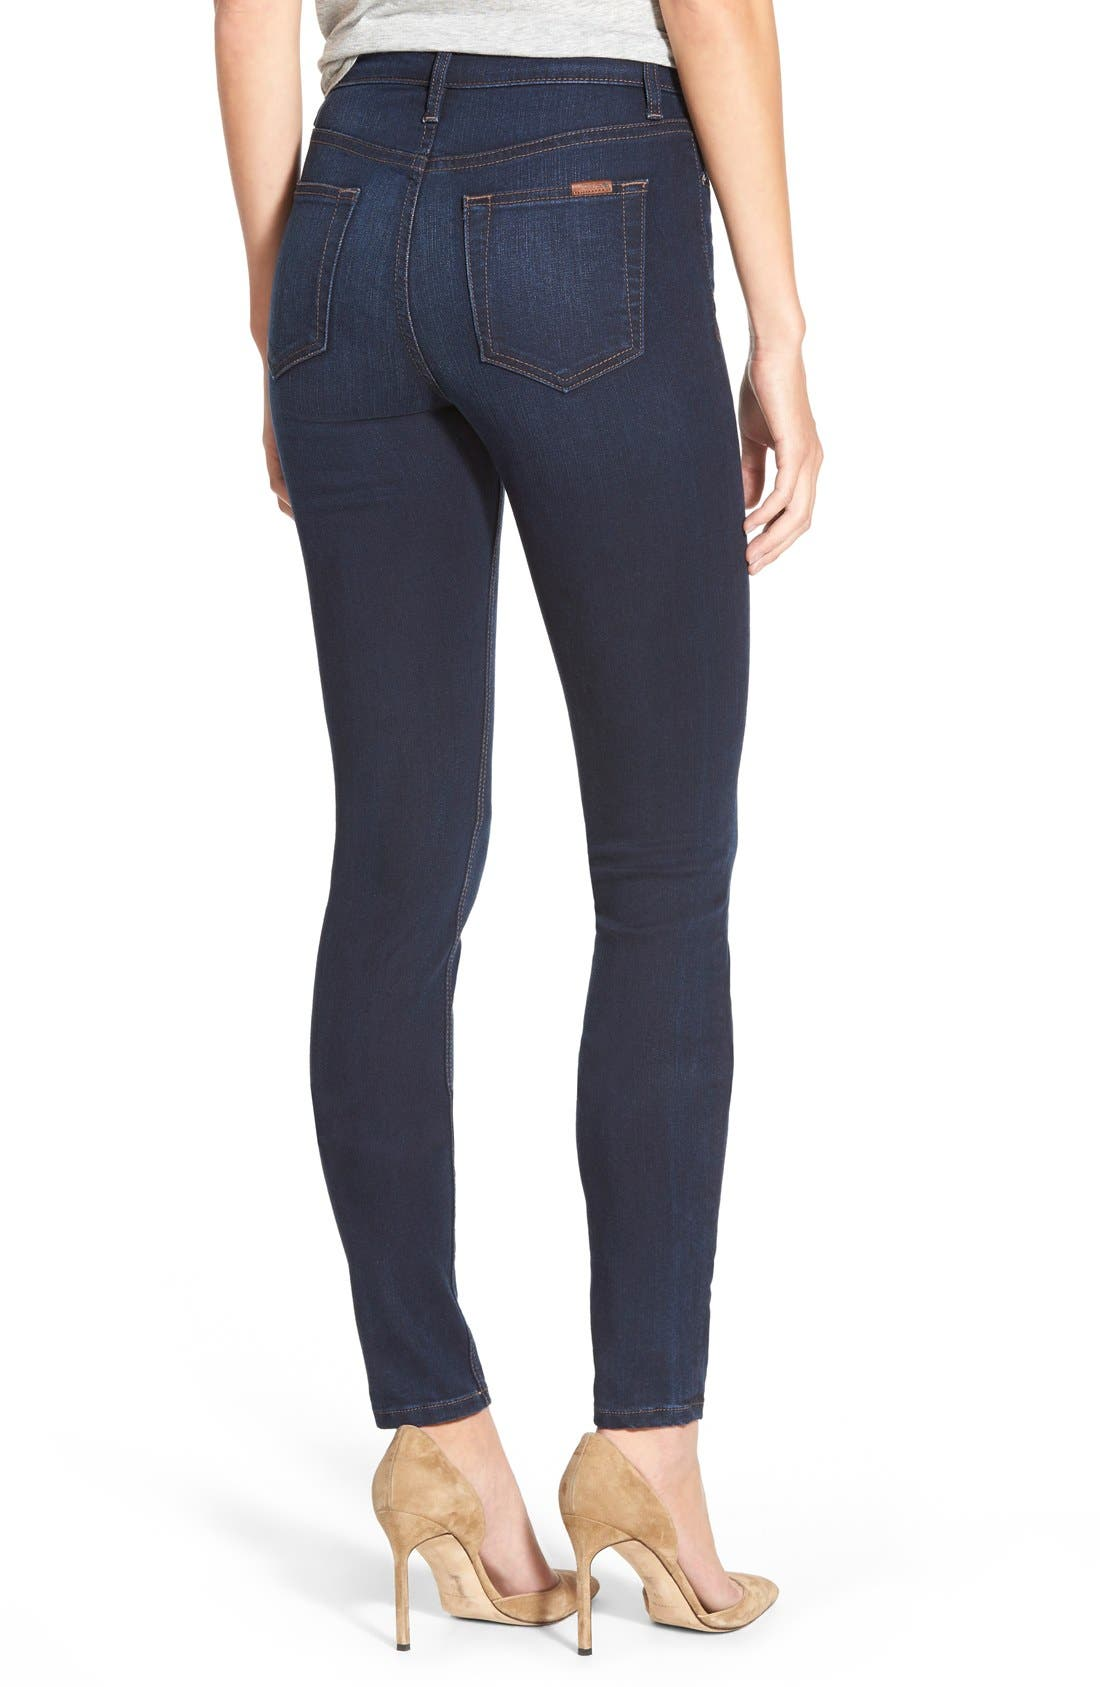 Alternate Image 2  - Joe's 'Flawless -Charlie' High Rise Skinny Jeans (Cecily)